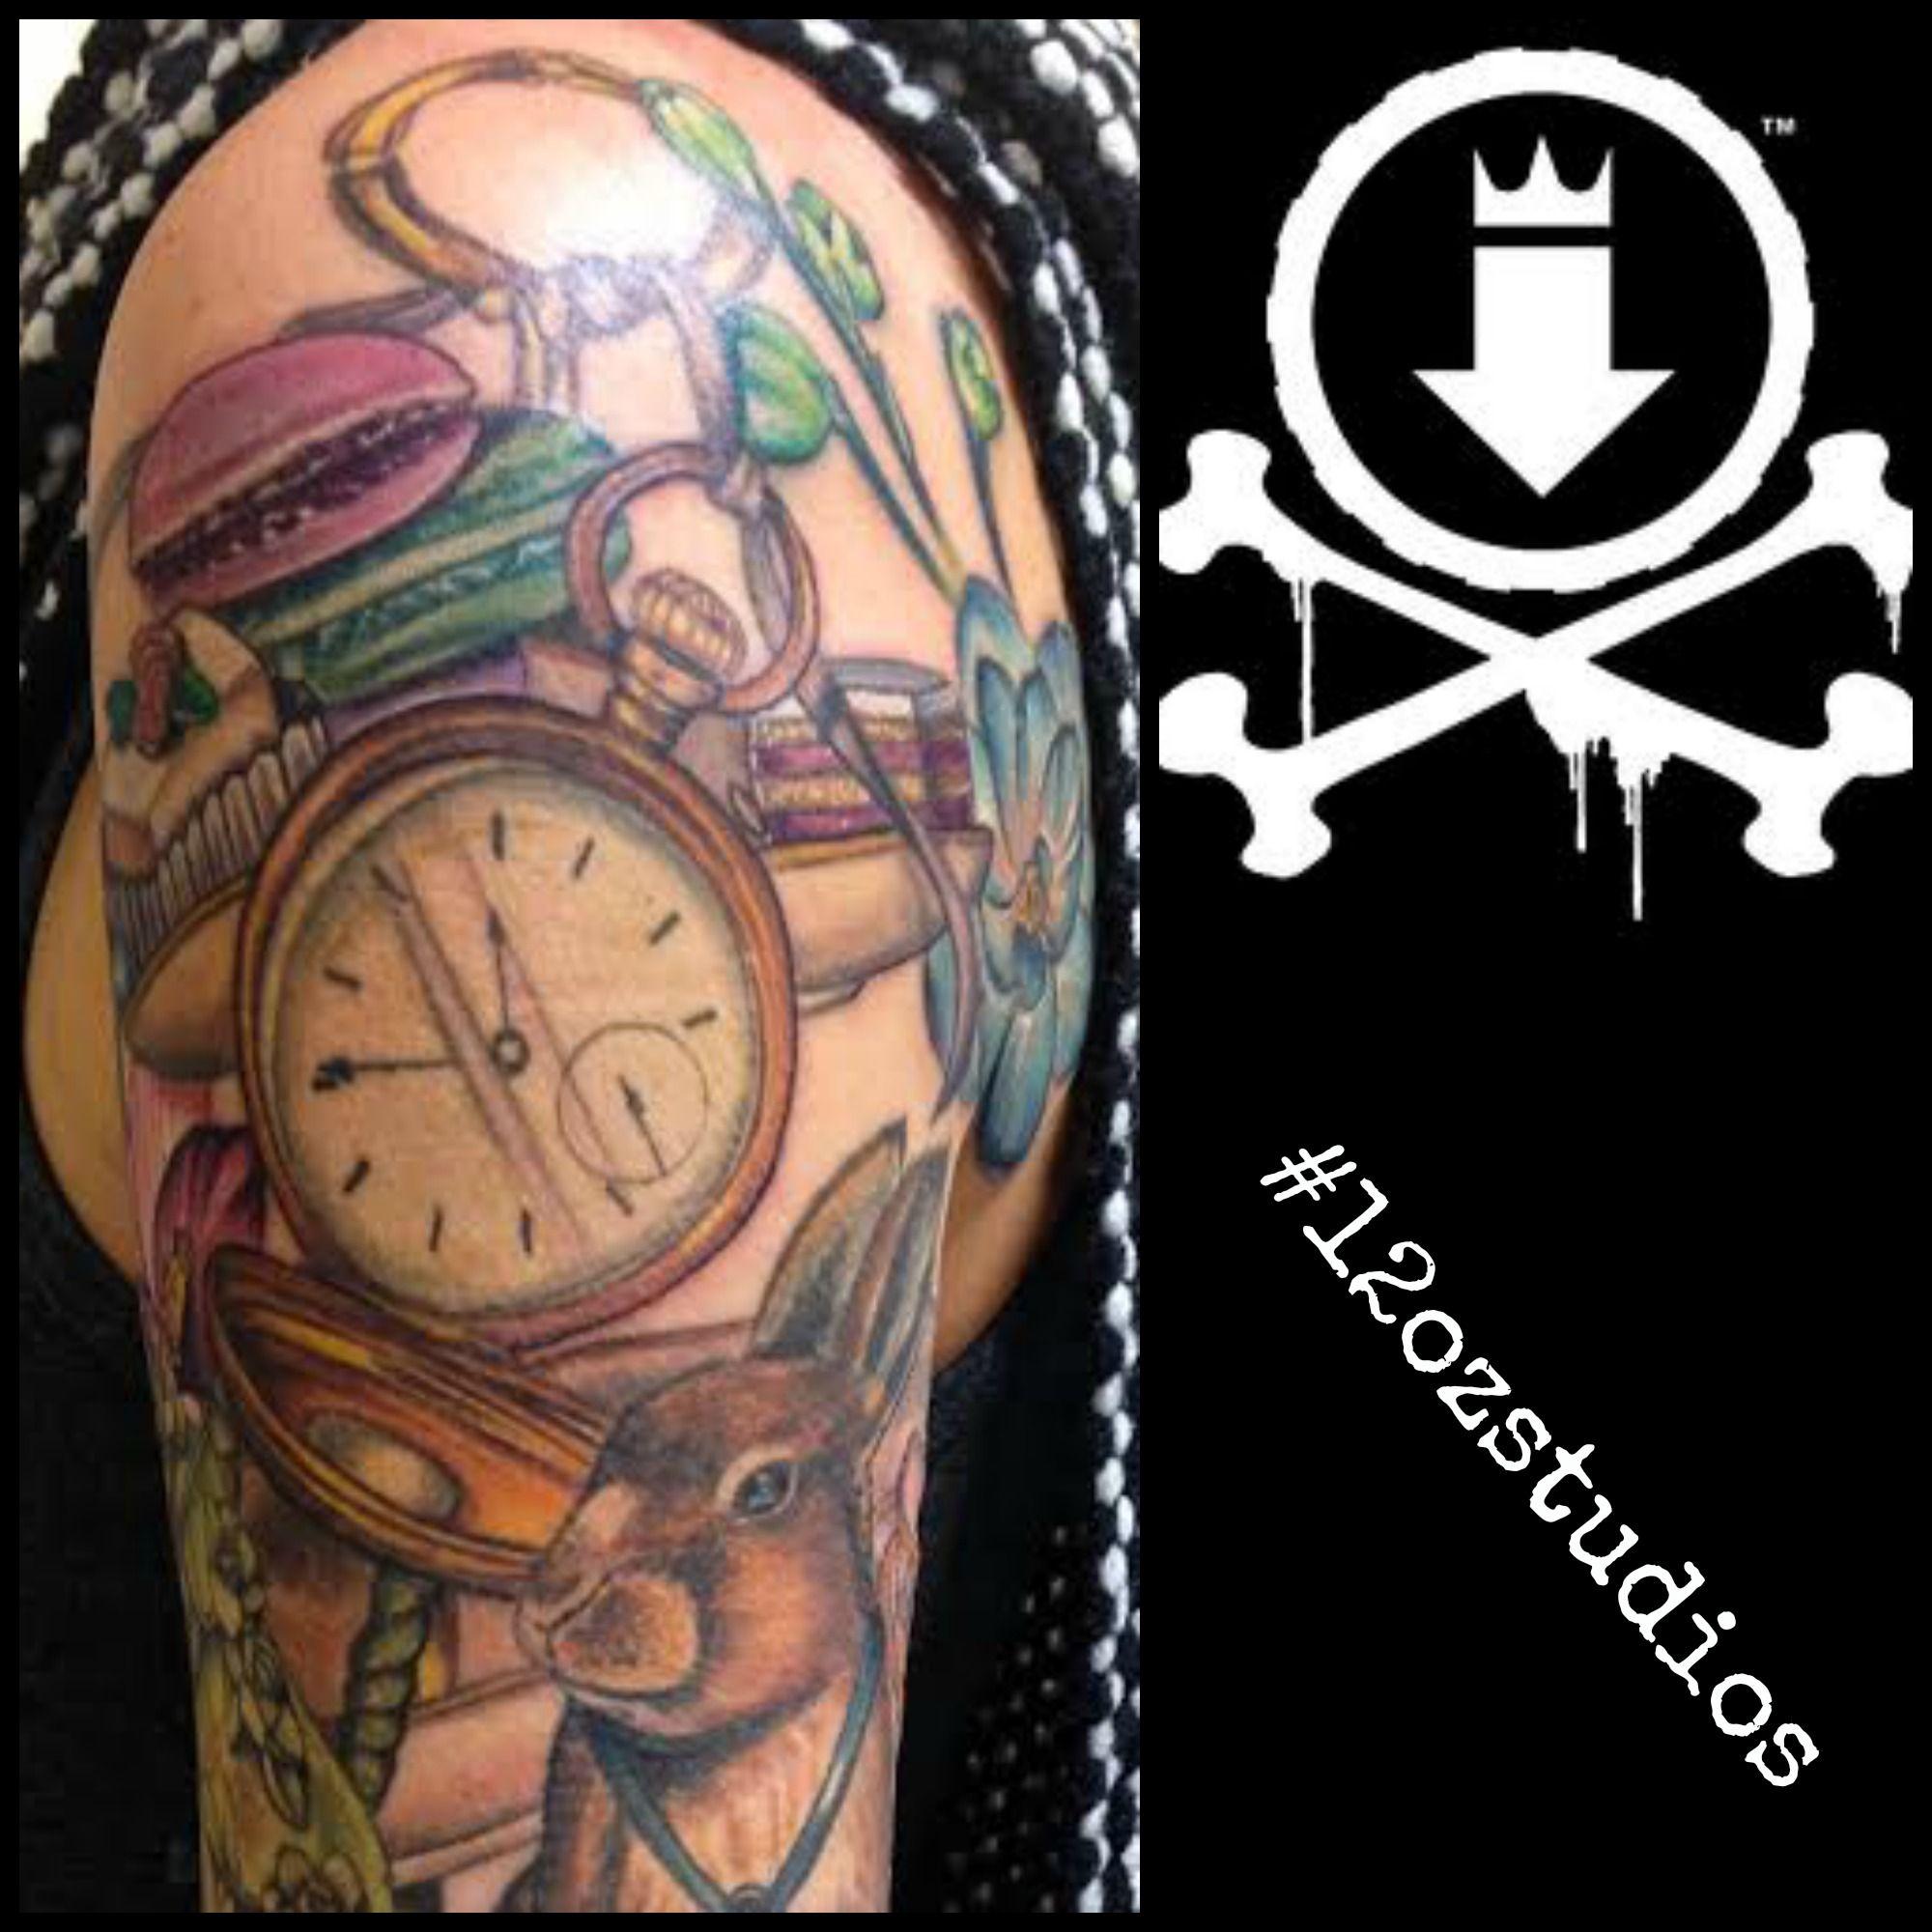 Full color Alice In Wonderland tattoo sleeve in progress female ... - Tattoo Alice Im Wunderland